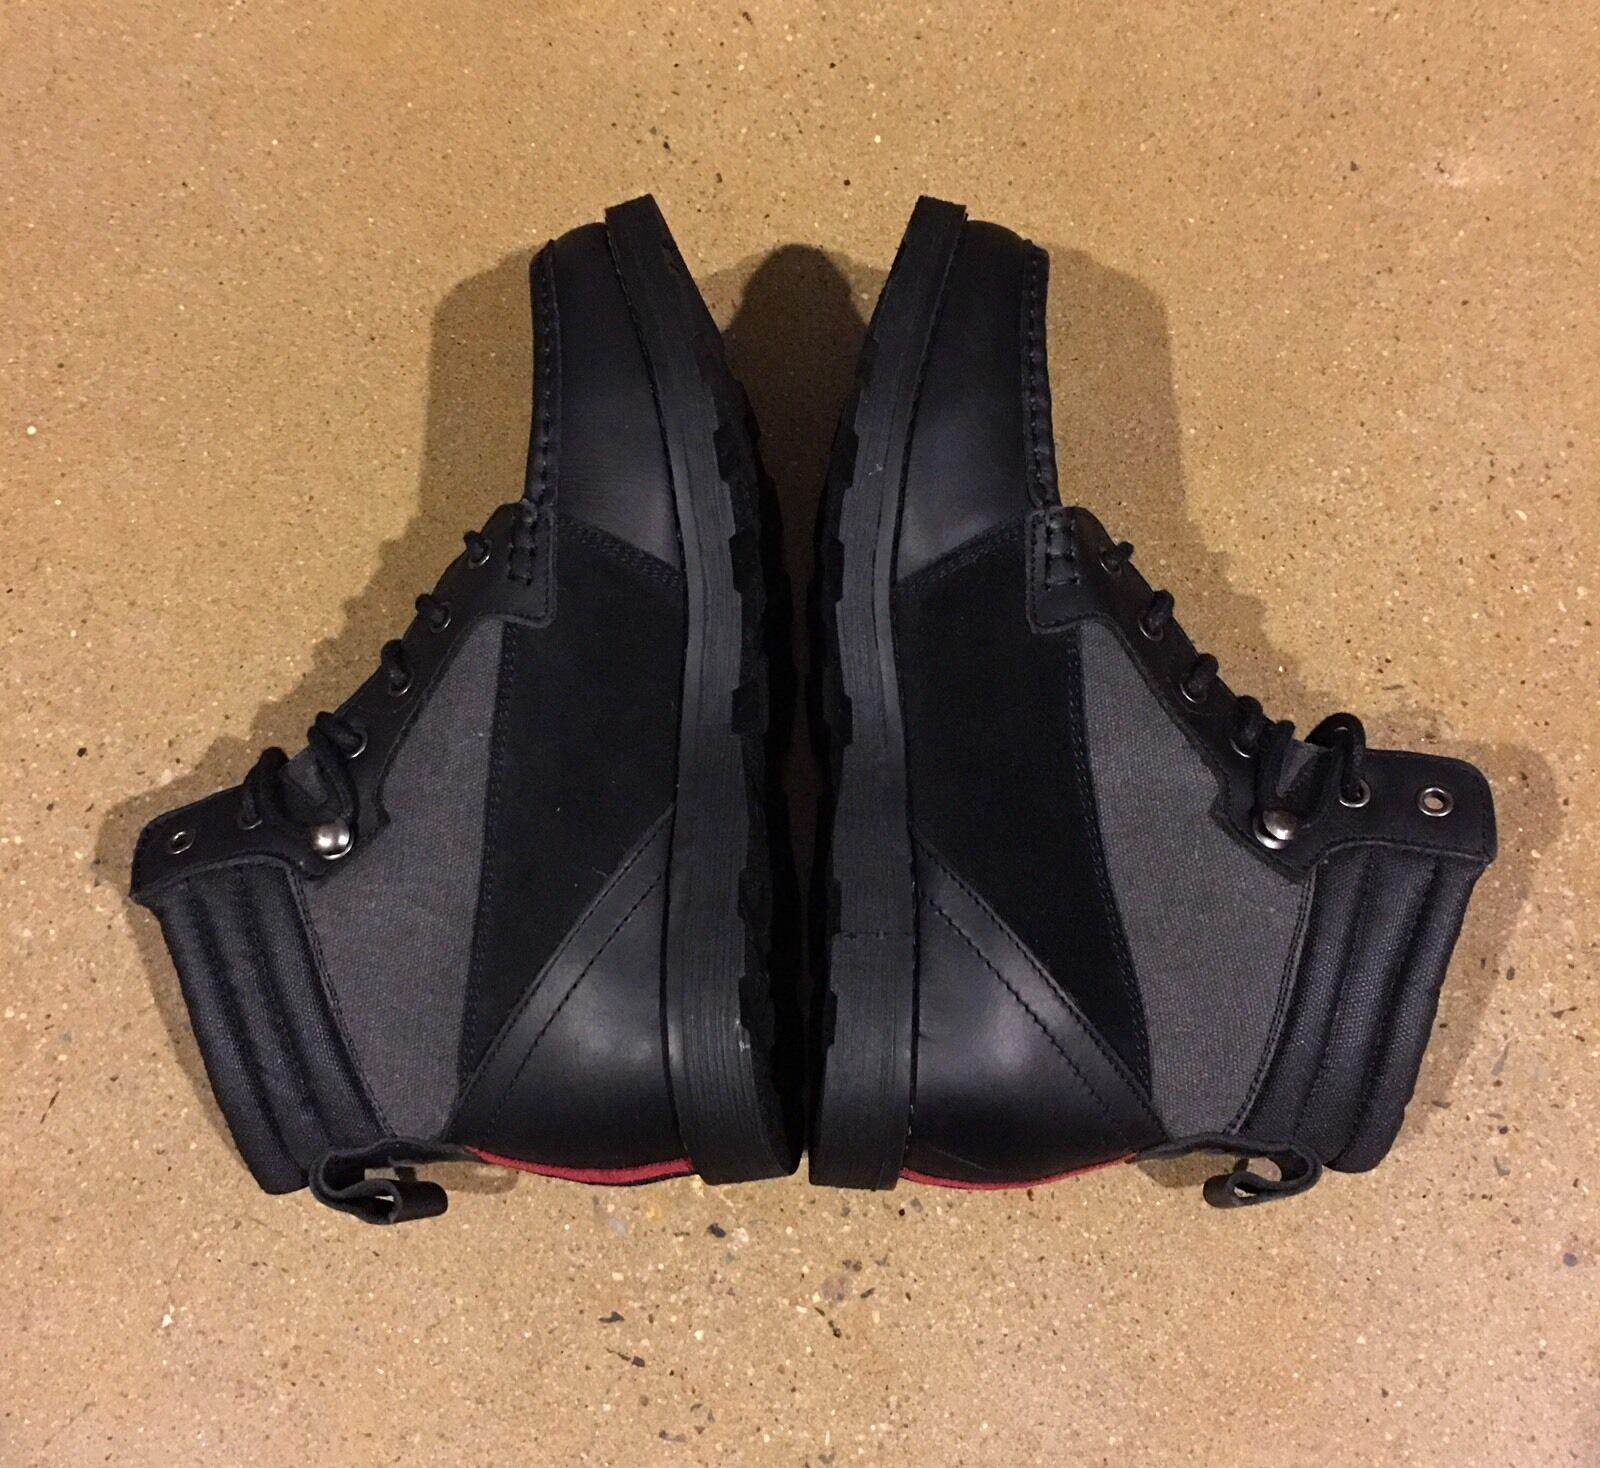 DVS Bishop Boots Men's Size 8.5 US Black Leather Cordura BMX DC Skate Chukkas